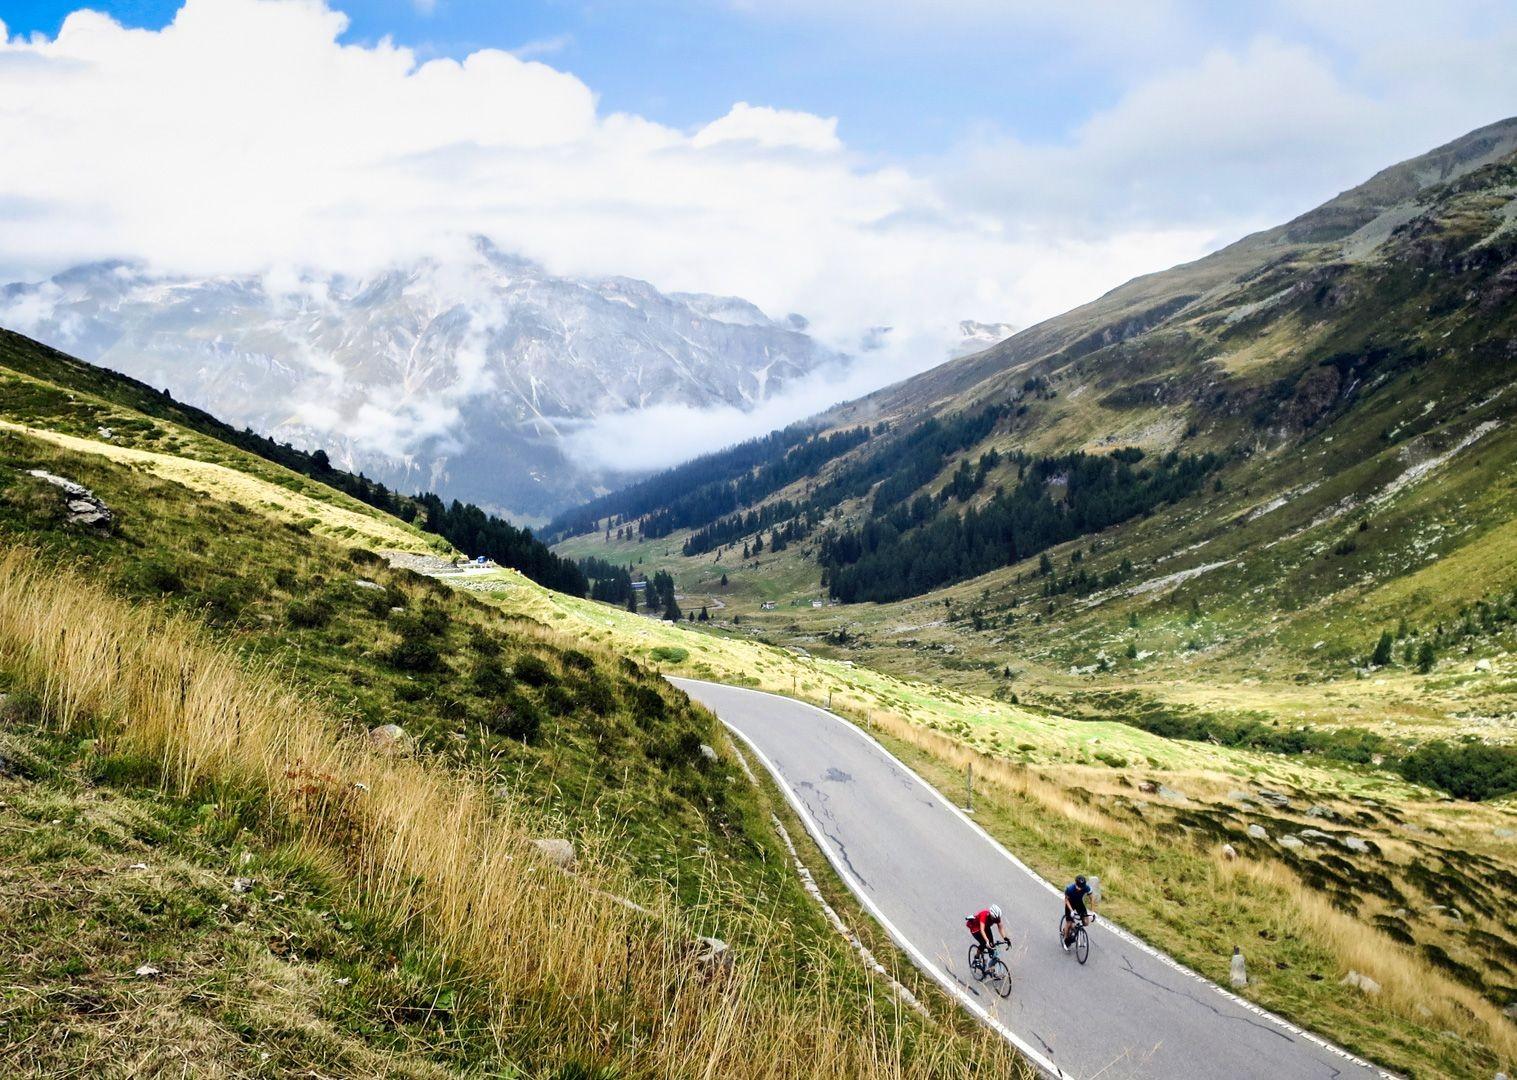 road-cycling-climbing-passo-di-spluga-italy.jpg - Italy - Raid Dolomiti - Guided Road Cycling Holiday - Italia Road Cycling